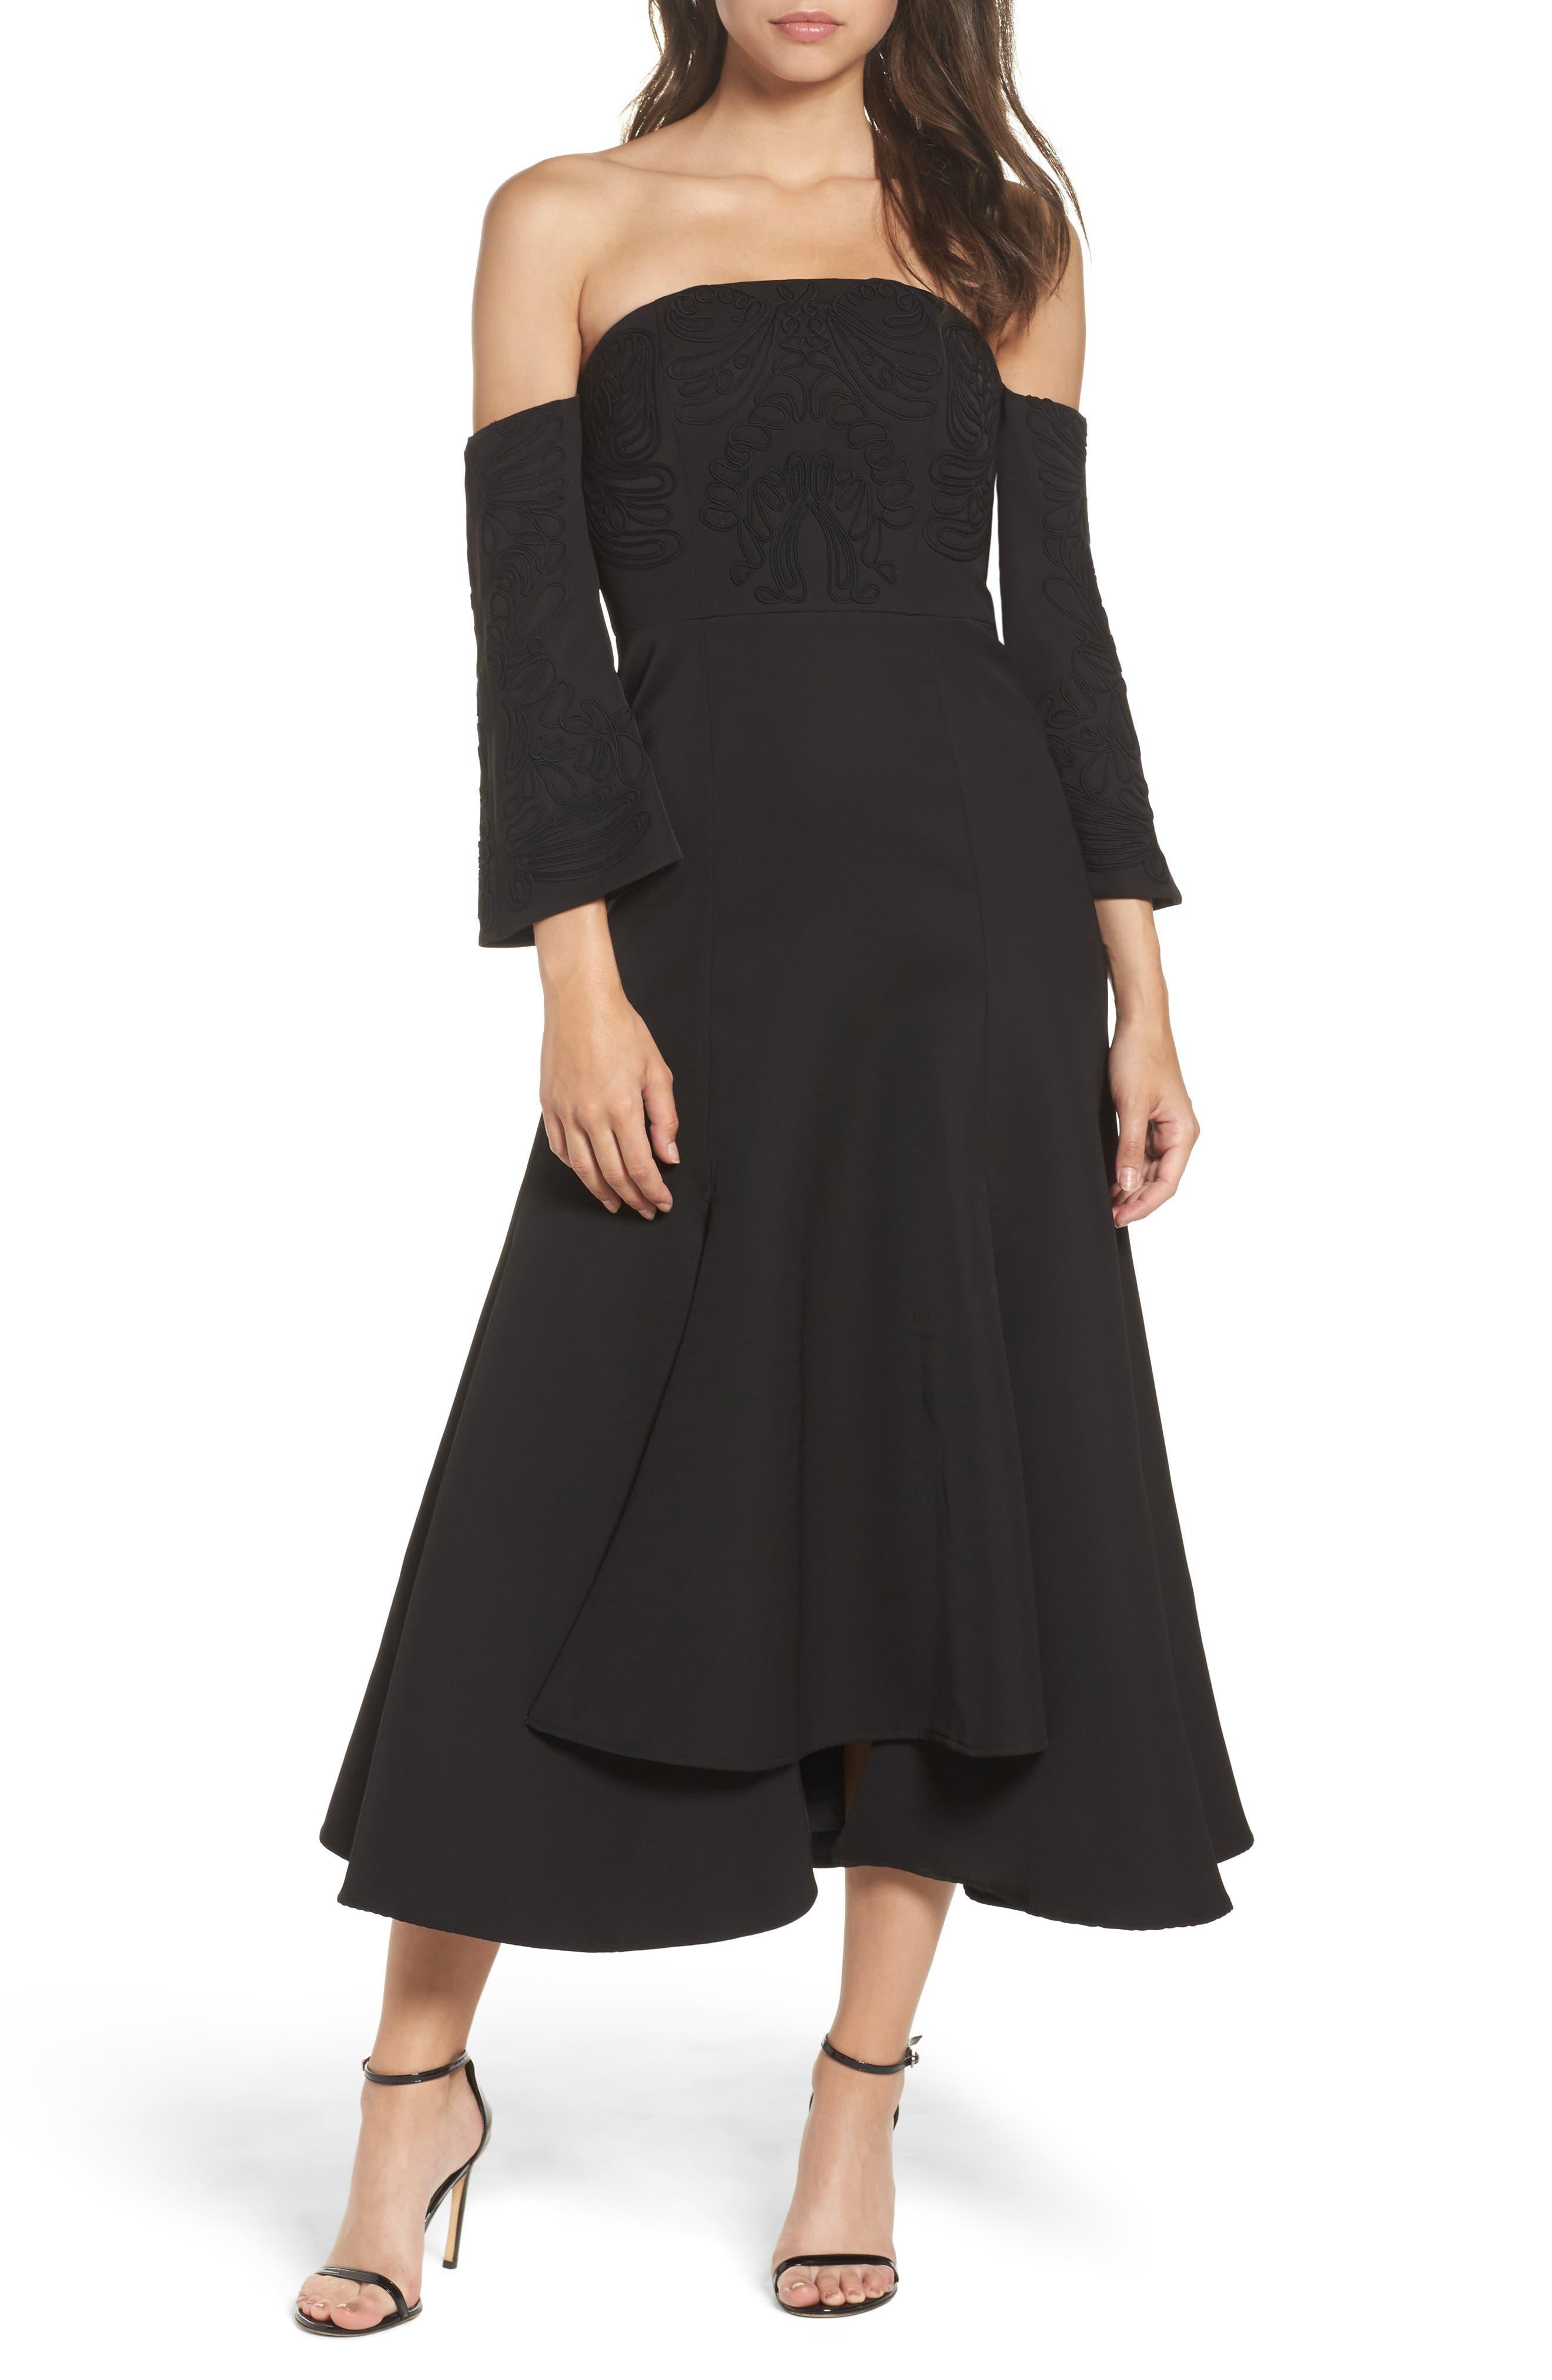 Paradise Off the Shoulder Midi Dress,                             Main thumbnail 1, color,                             Black